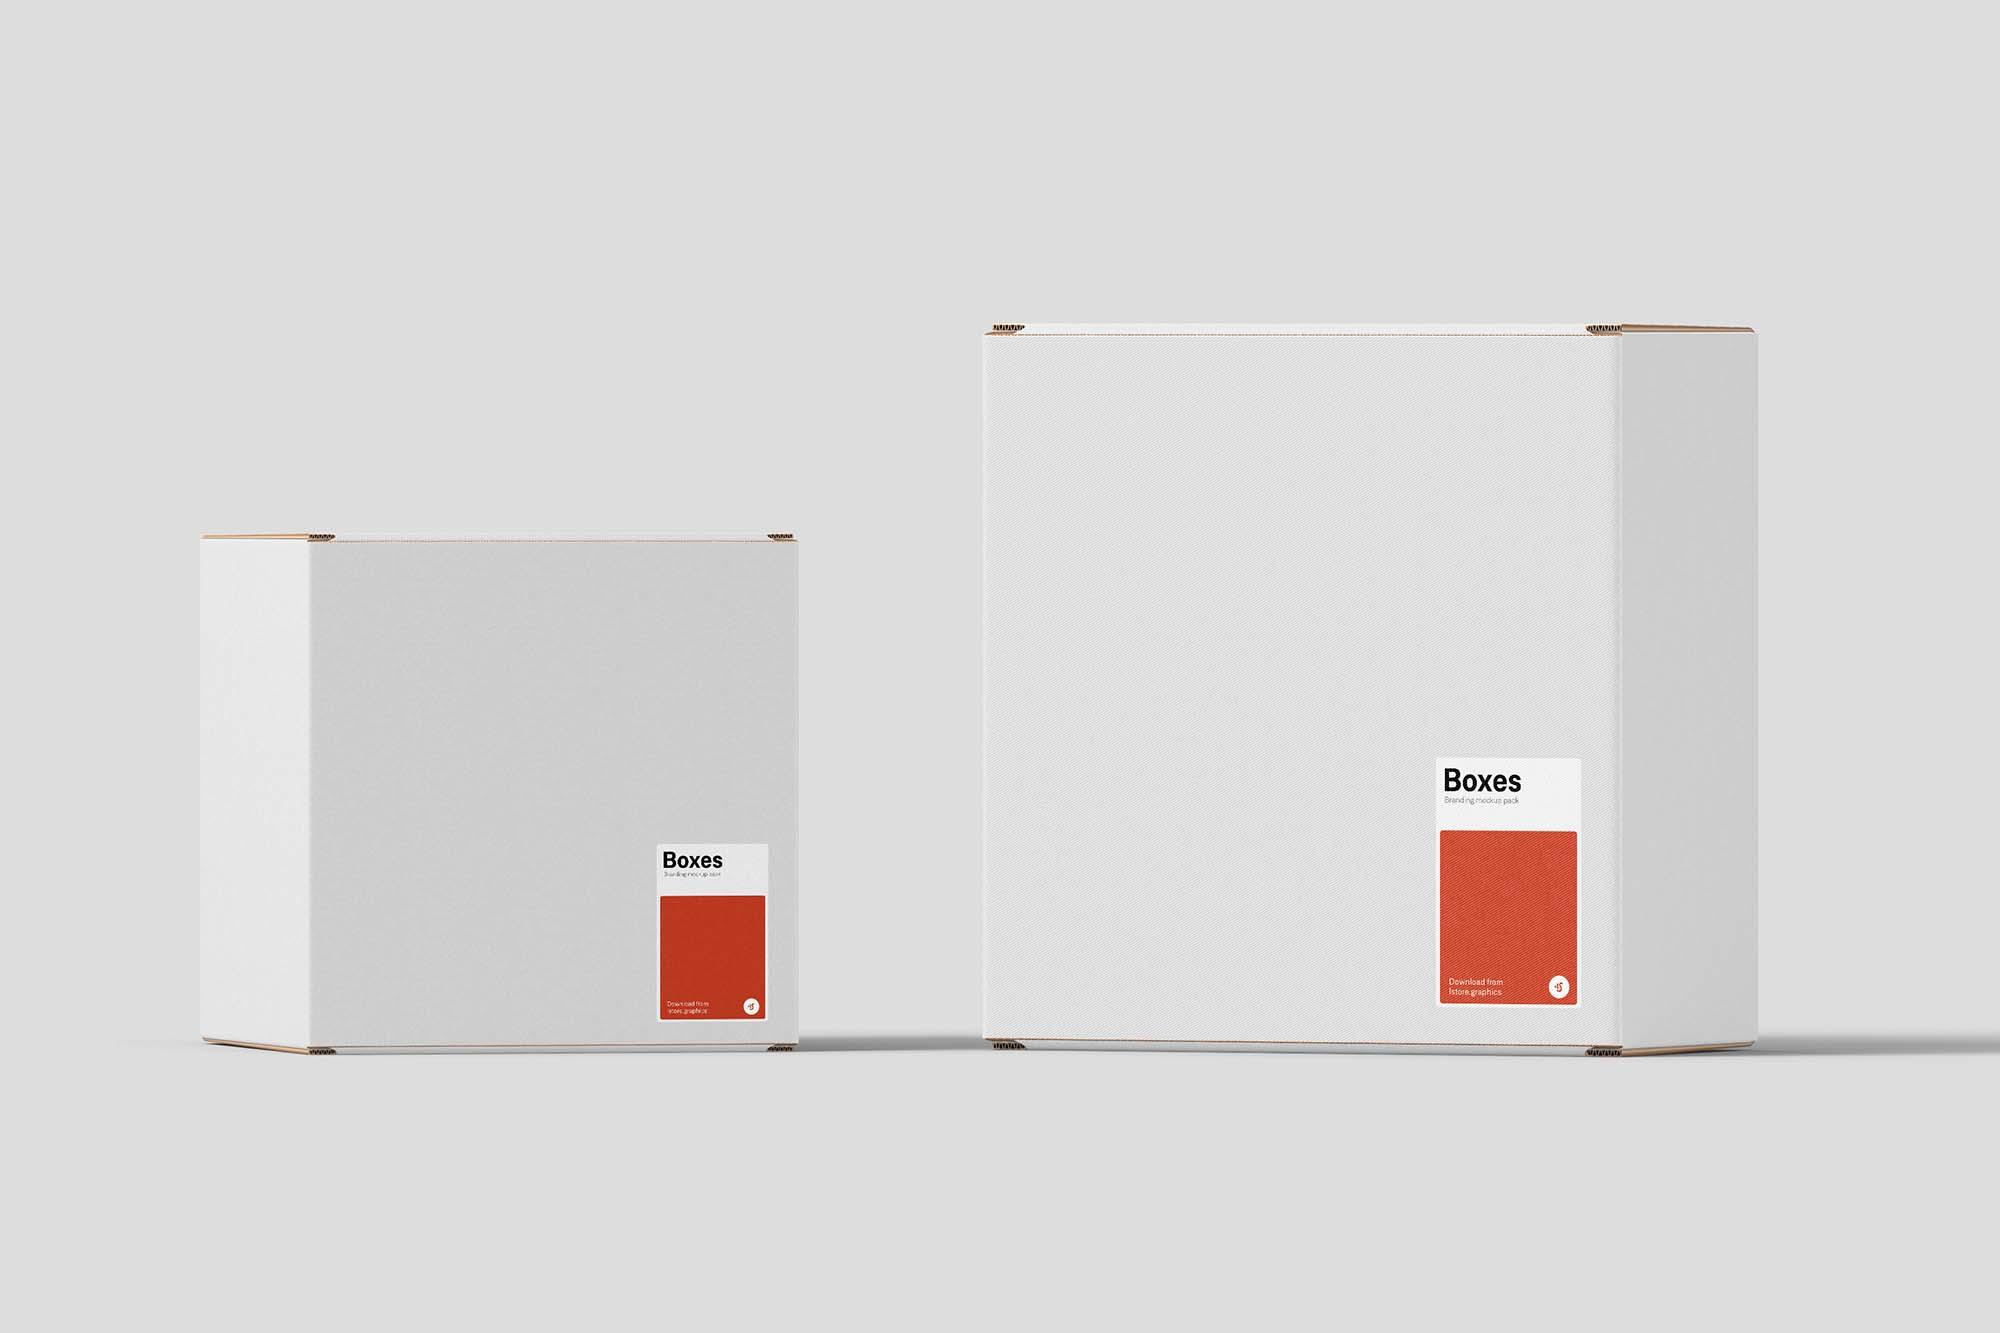 Boxes Mockup 2